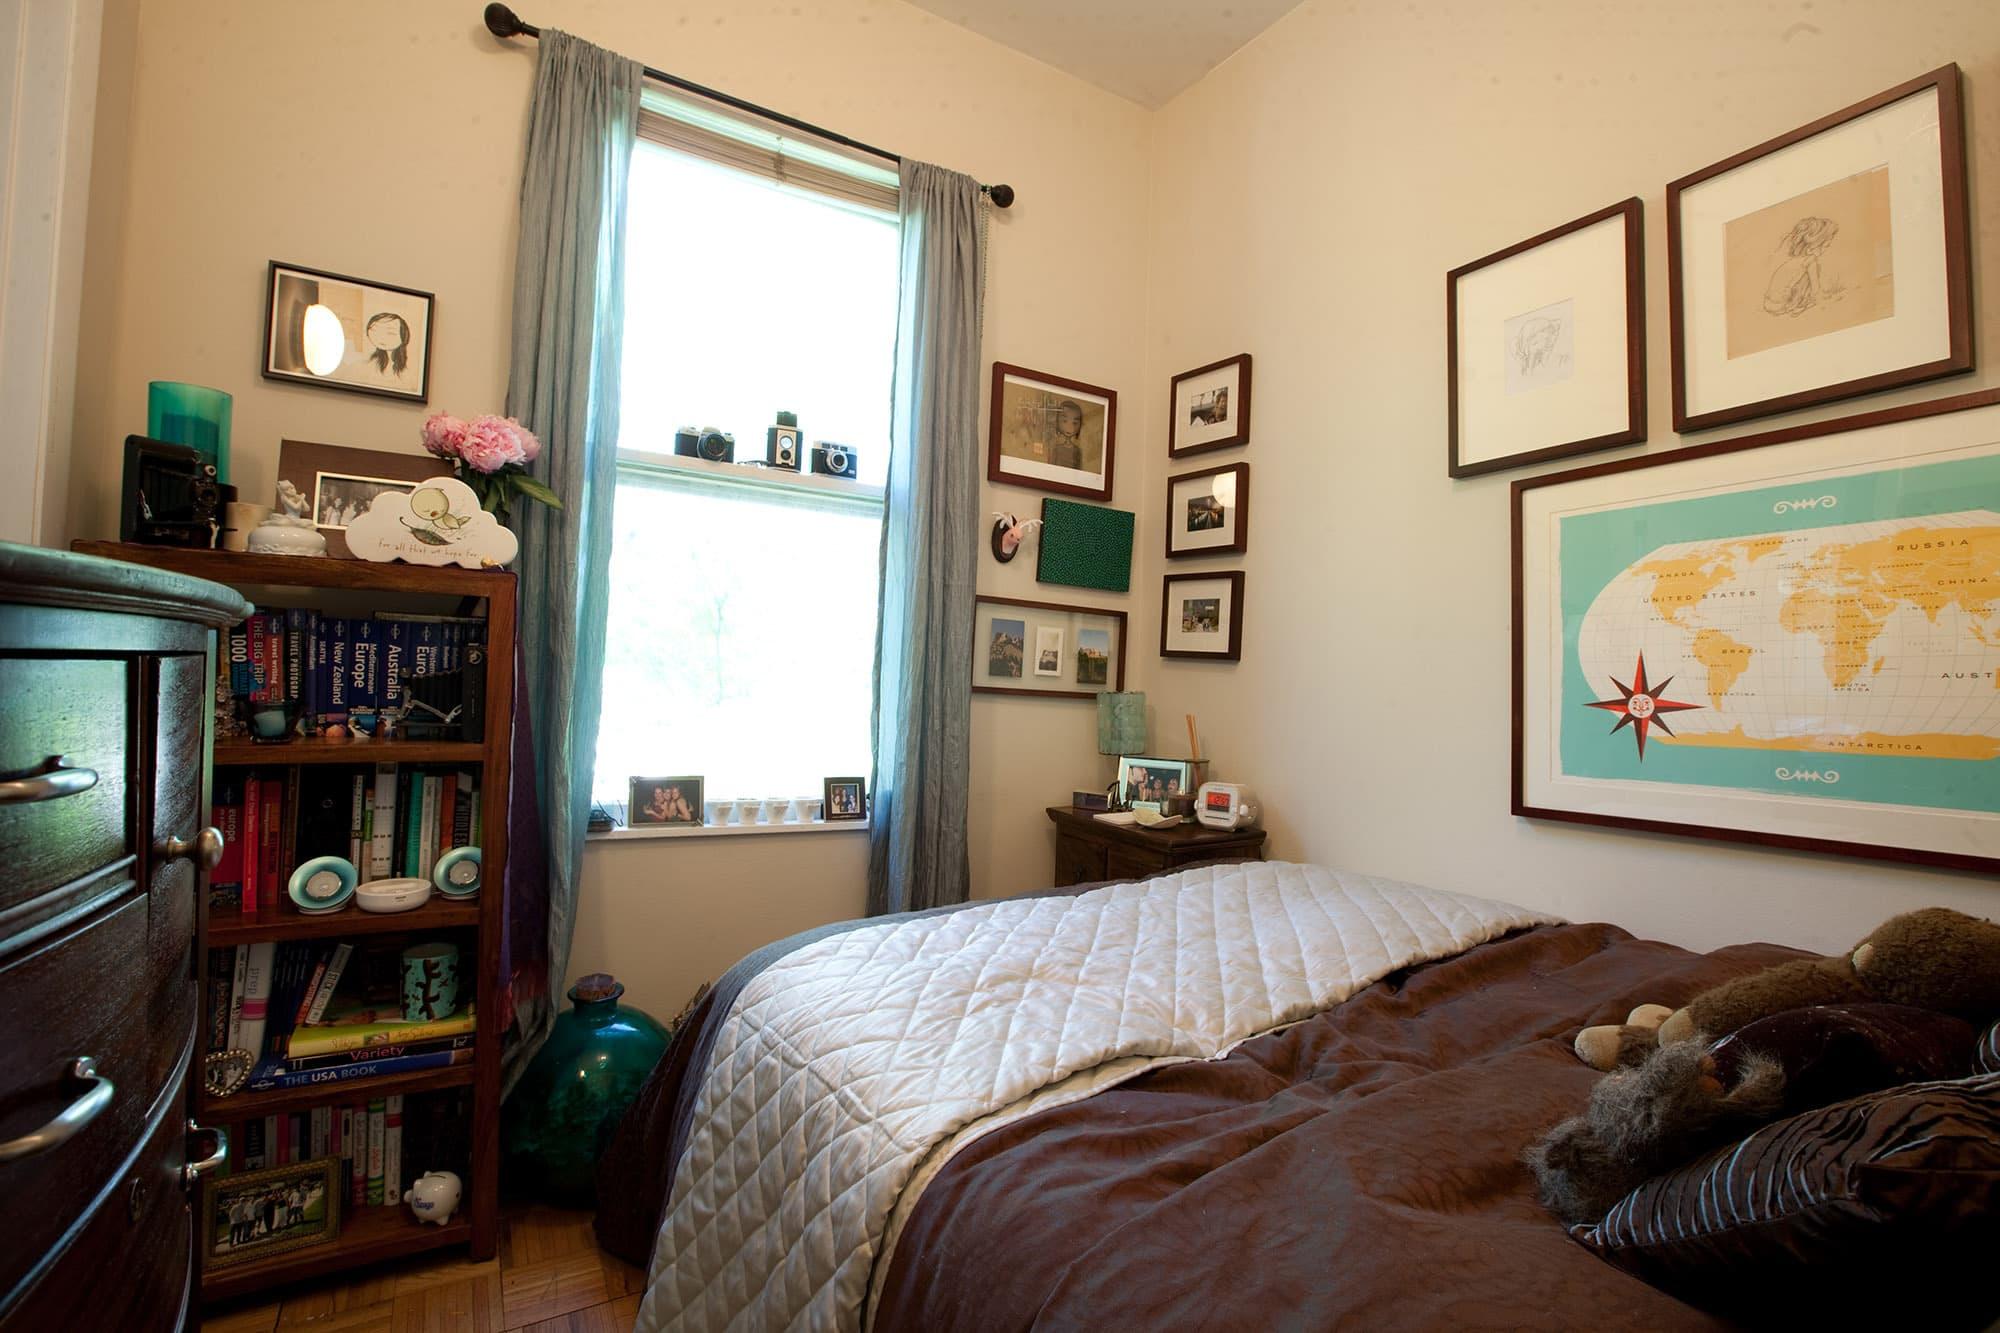 My Bedroom in Roscoe Village